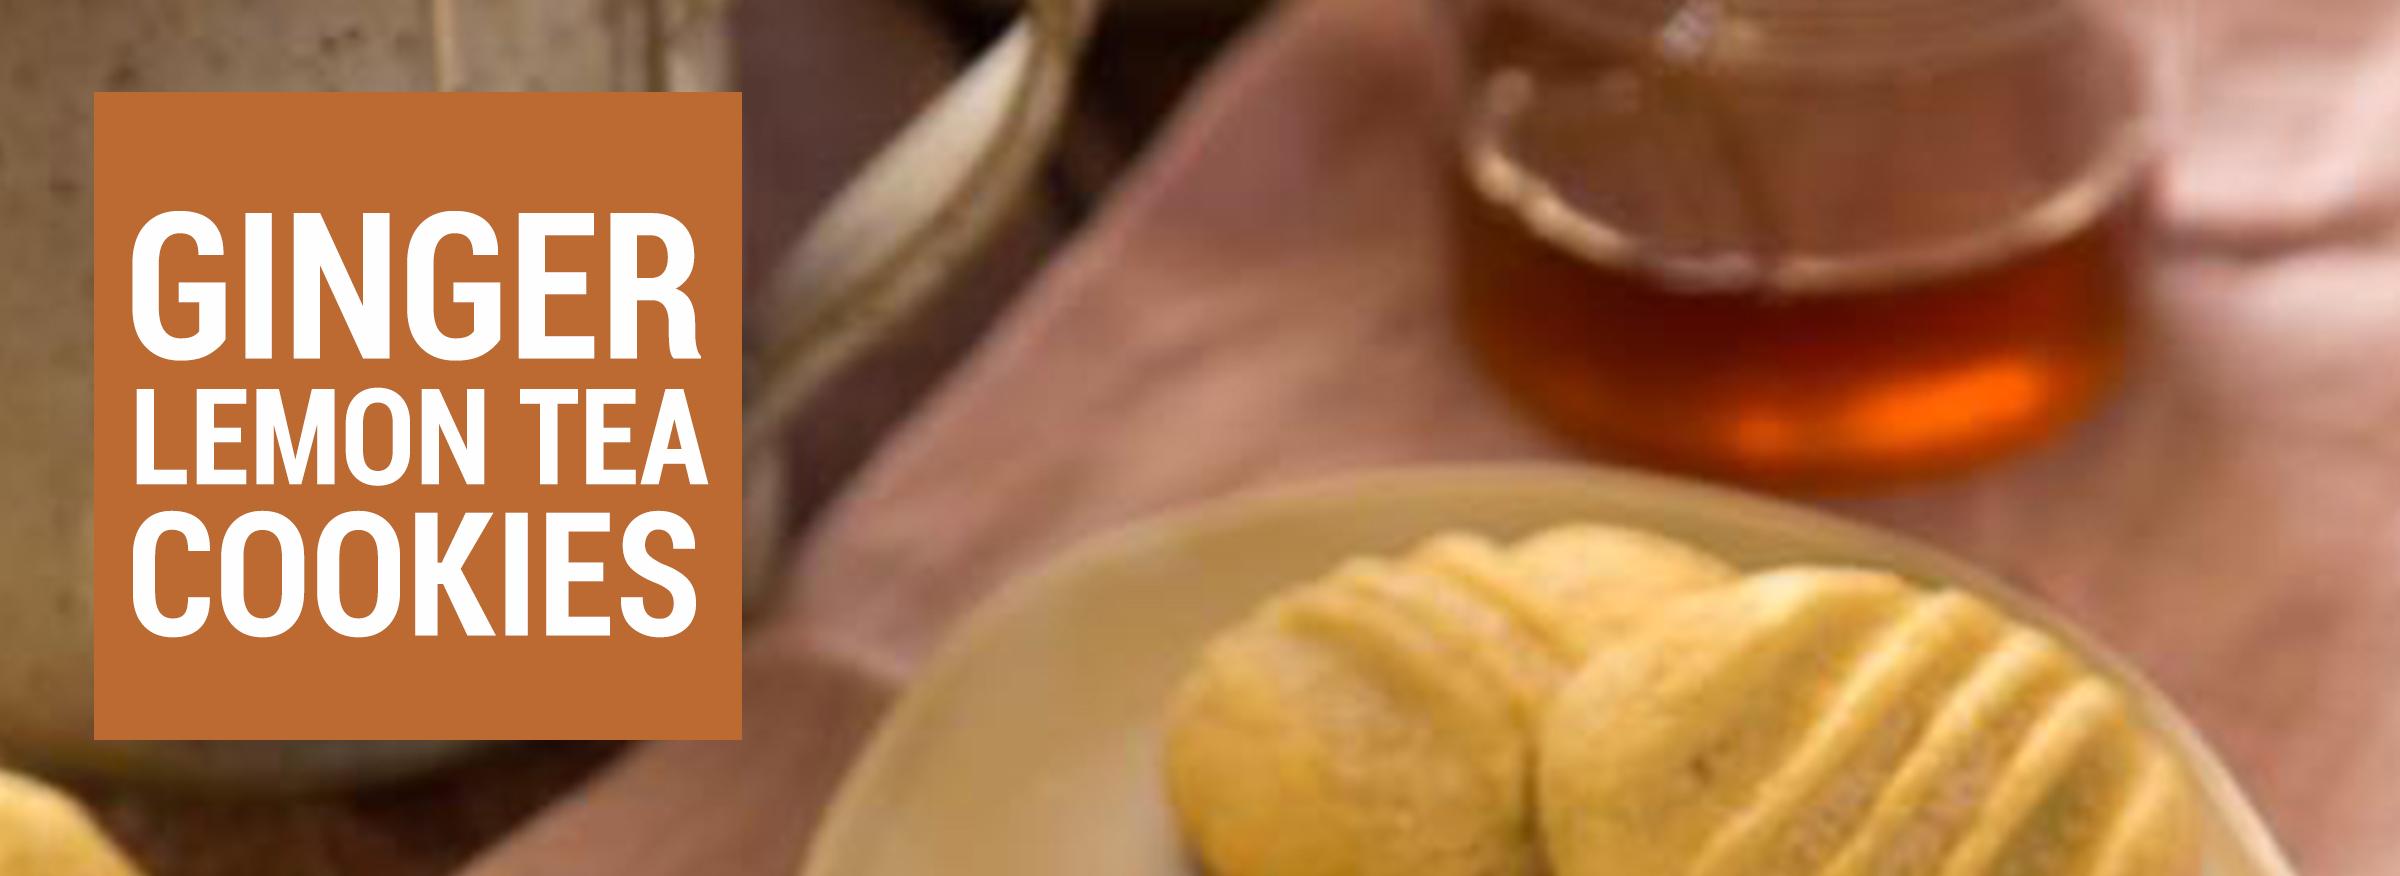 Ginger Lemon Tea Cookies